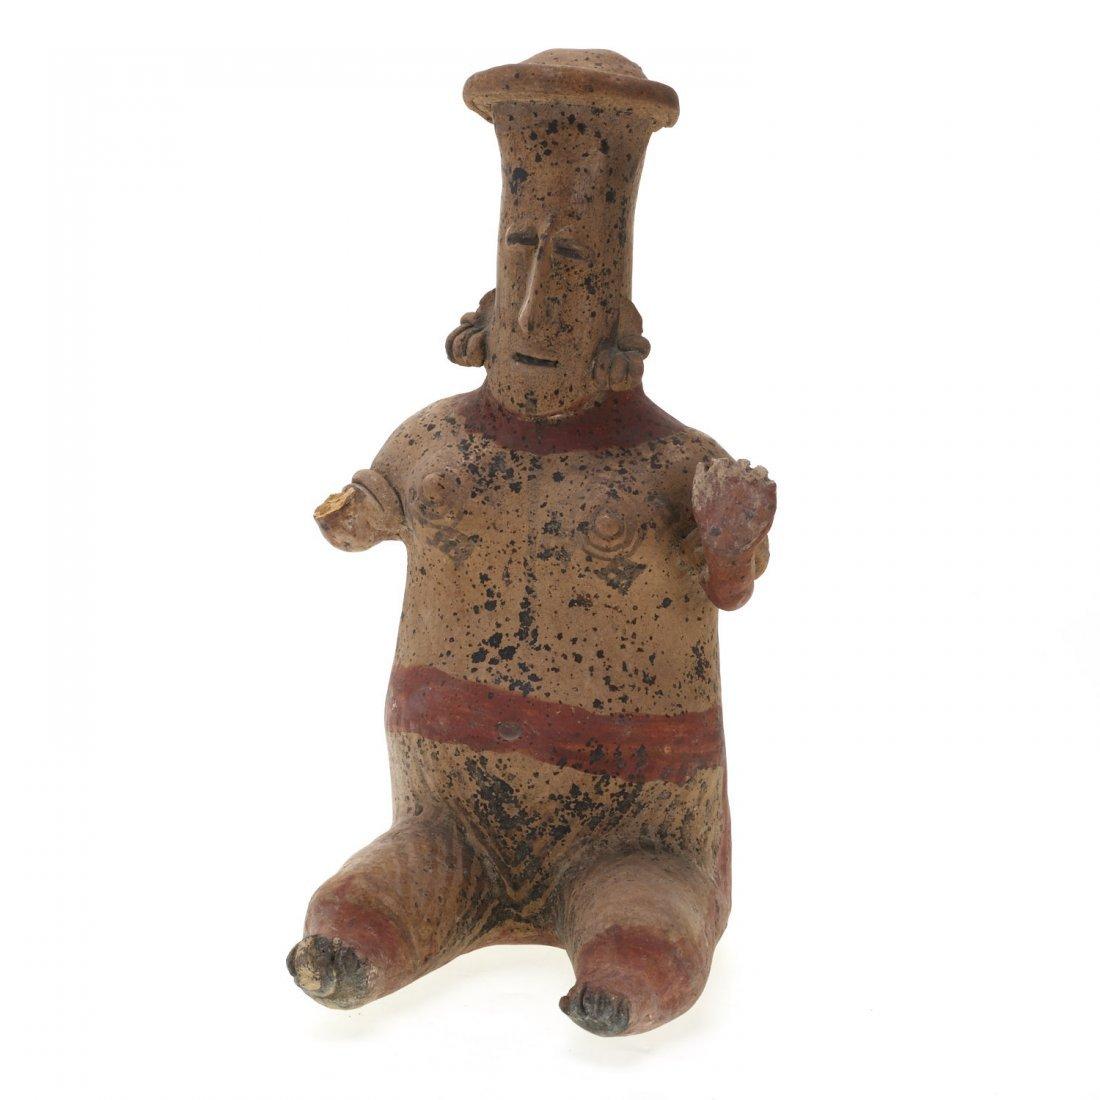 Nayarit style terra-cotta seated female figure